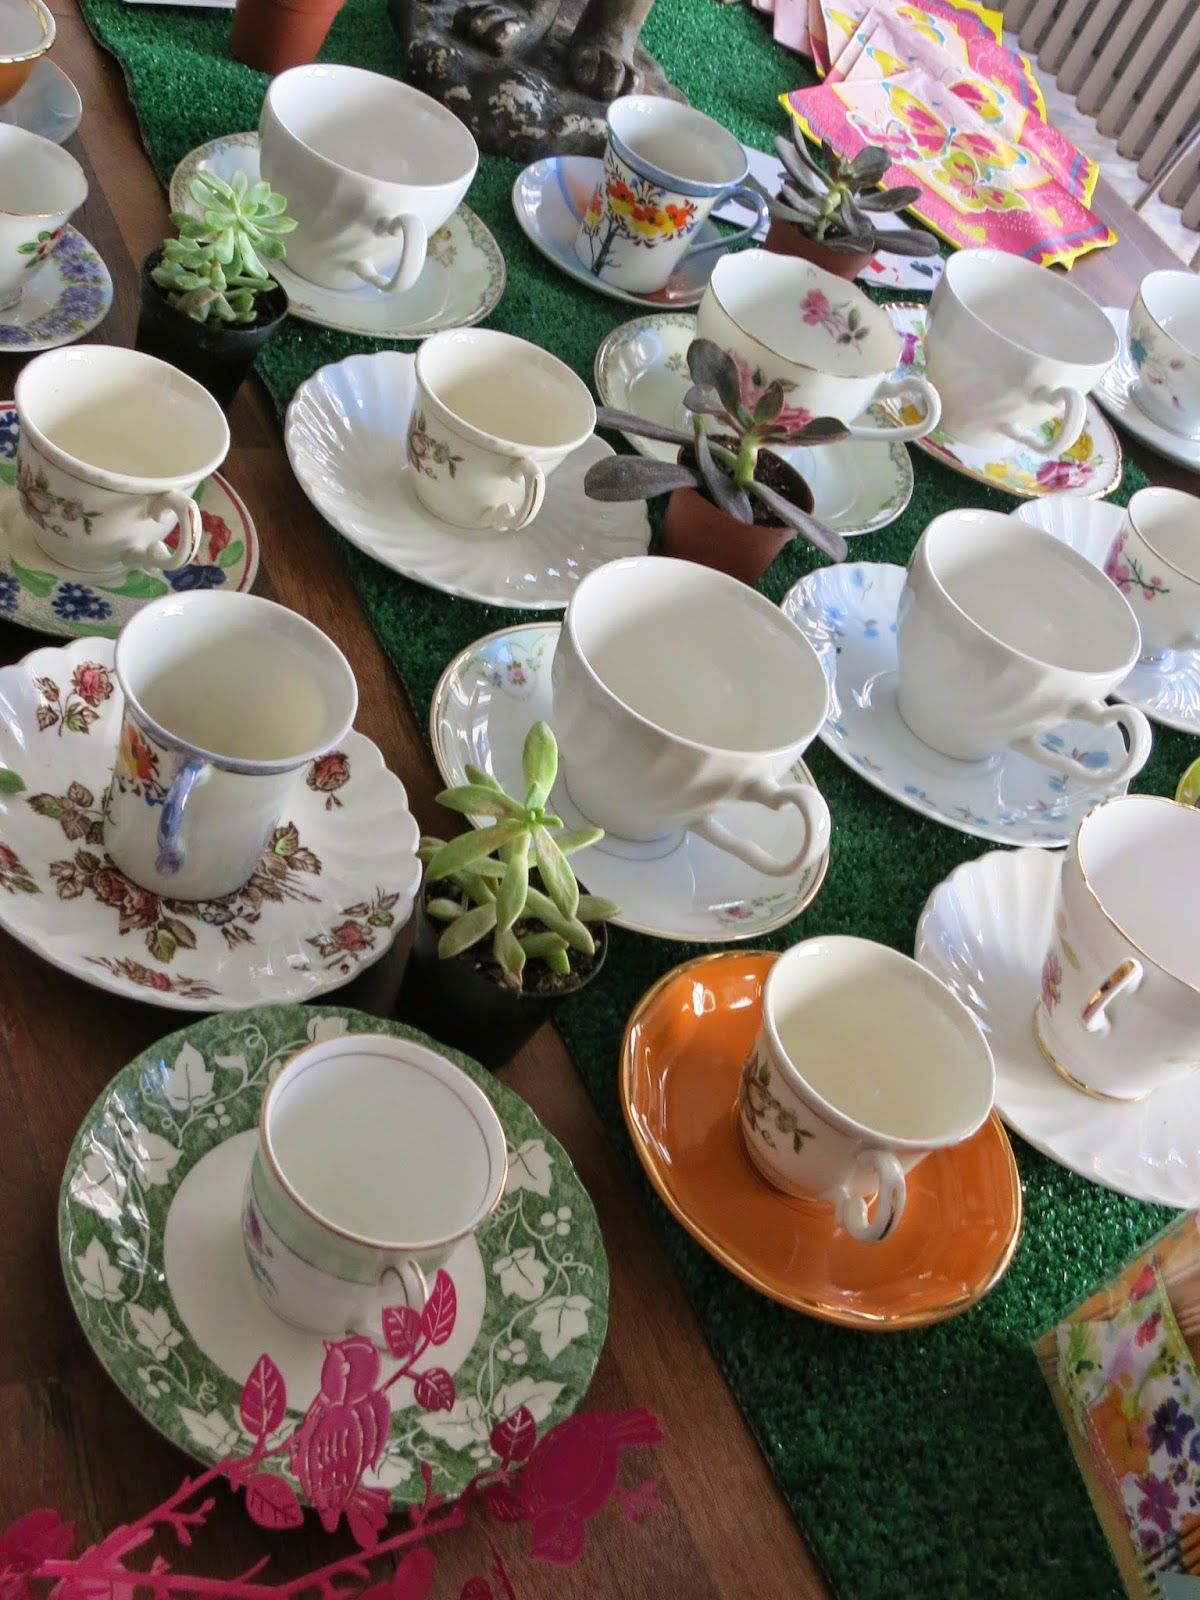 Gorgeous tea cups